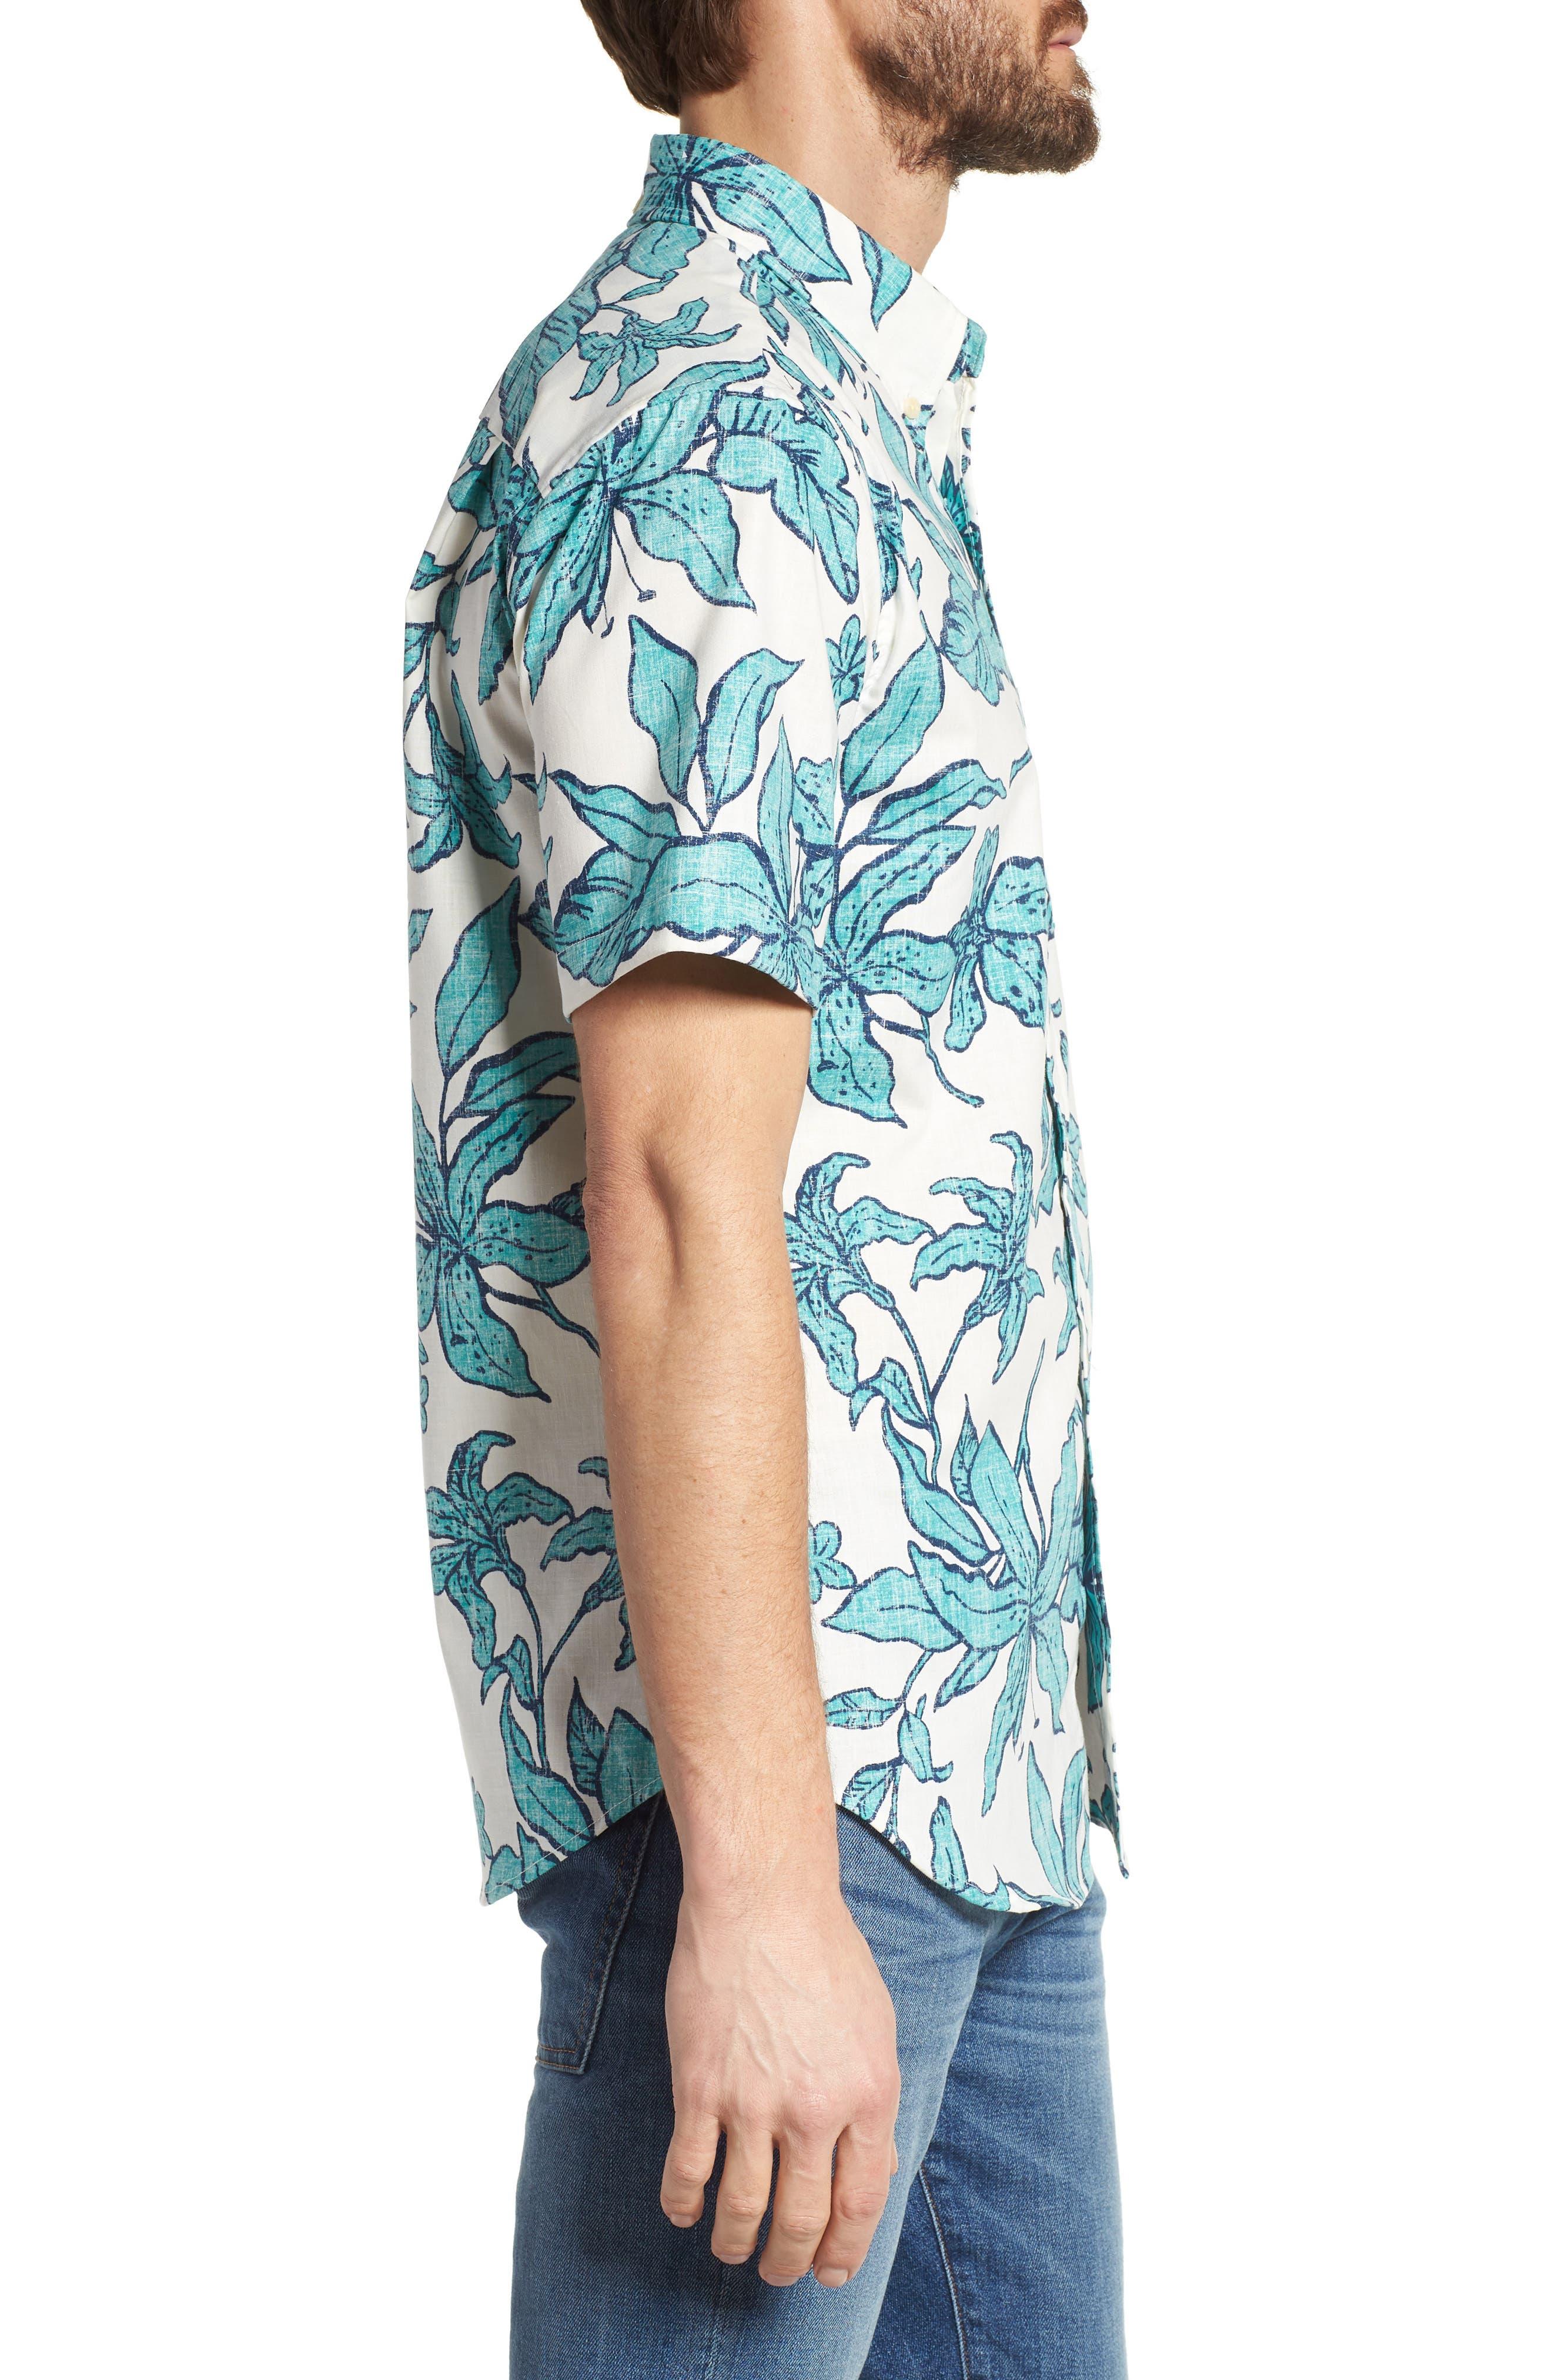 Luhiehu Tailored Fit Print Camp Shirt,                             Alternate thumbnail 3, color,                             104